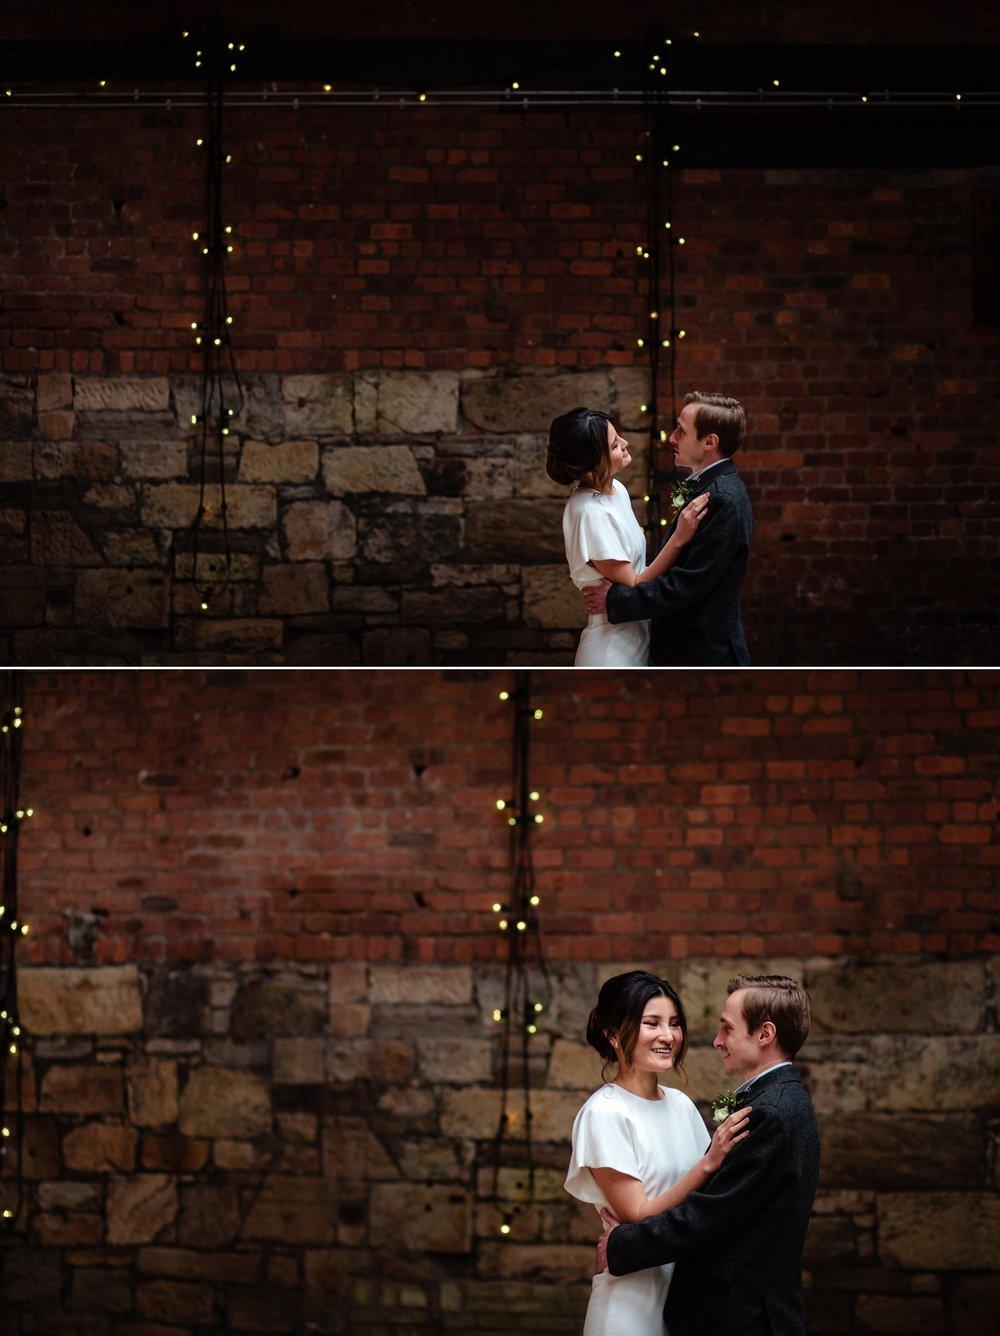 engine-works-wedding-styled-shoot-fotomaki-photography-96.jpg